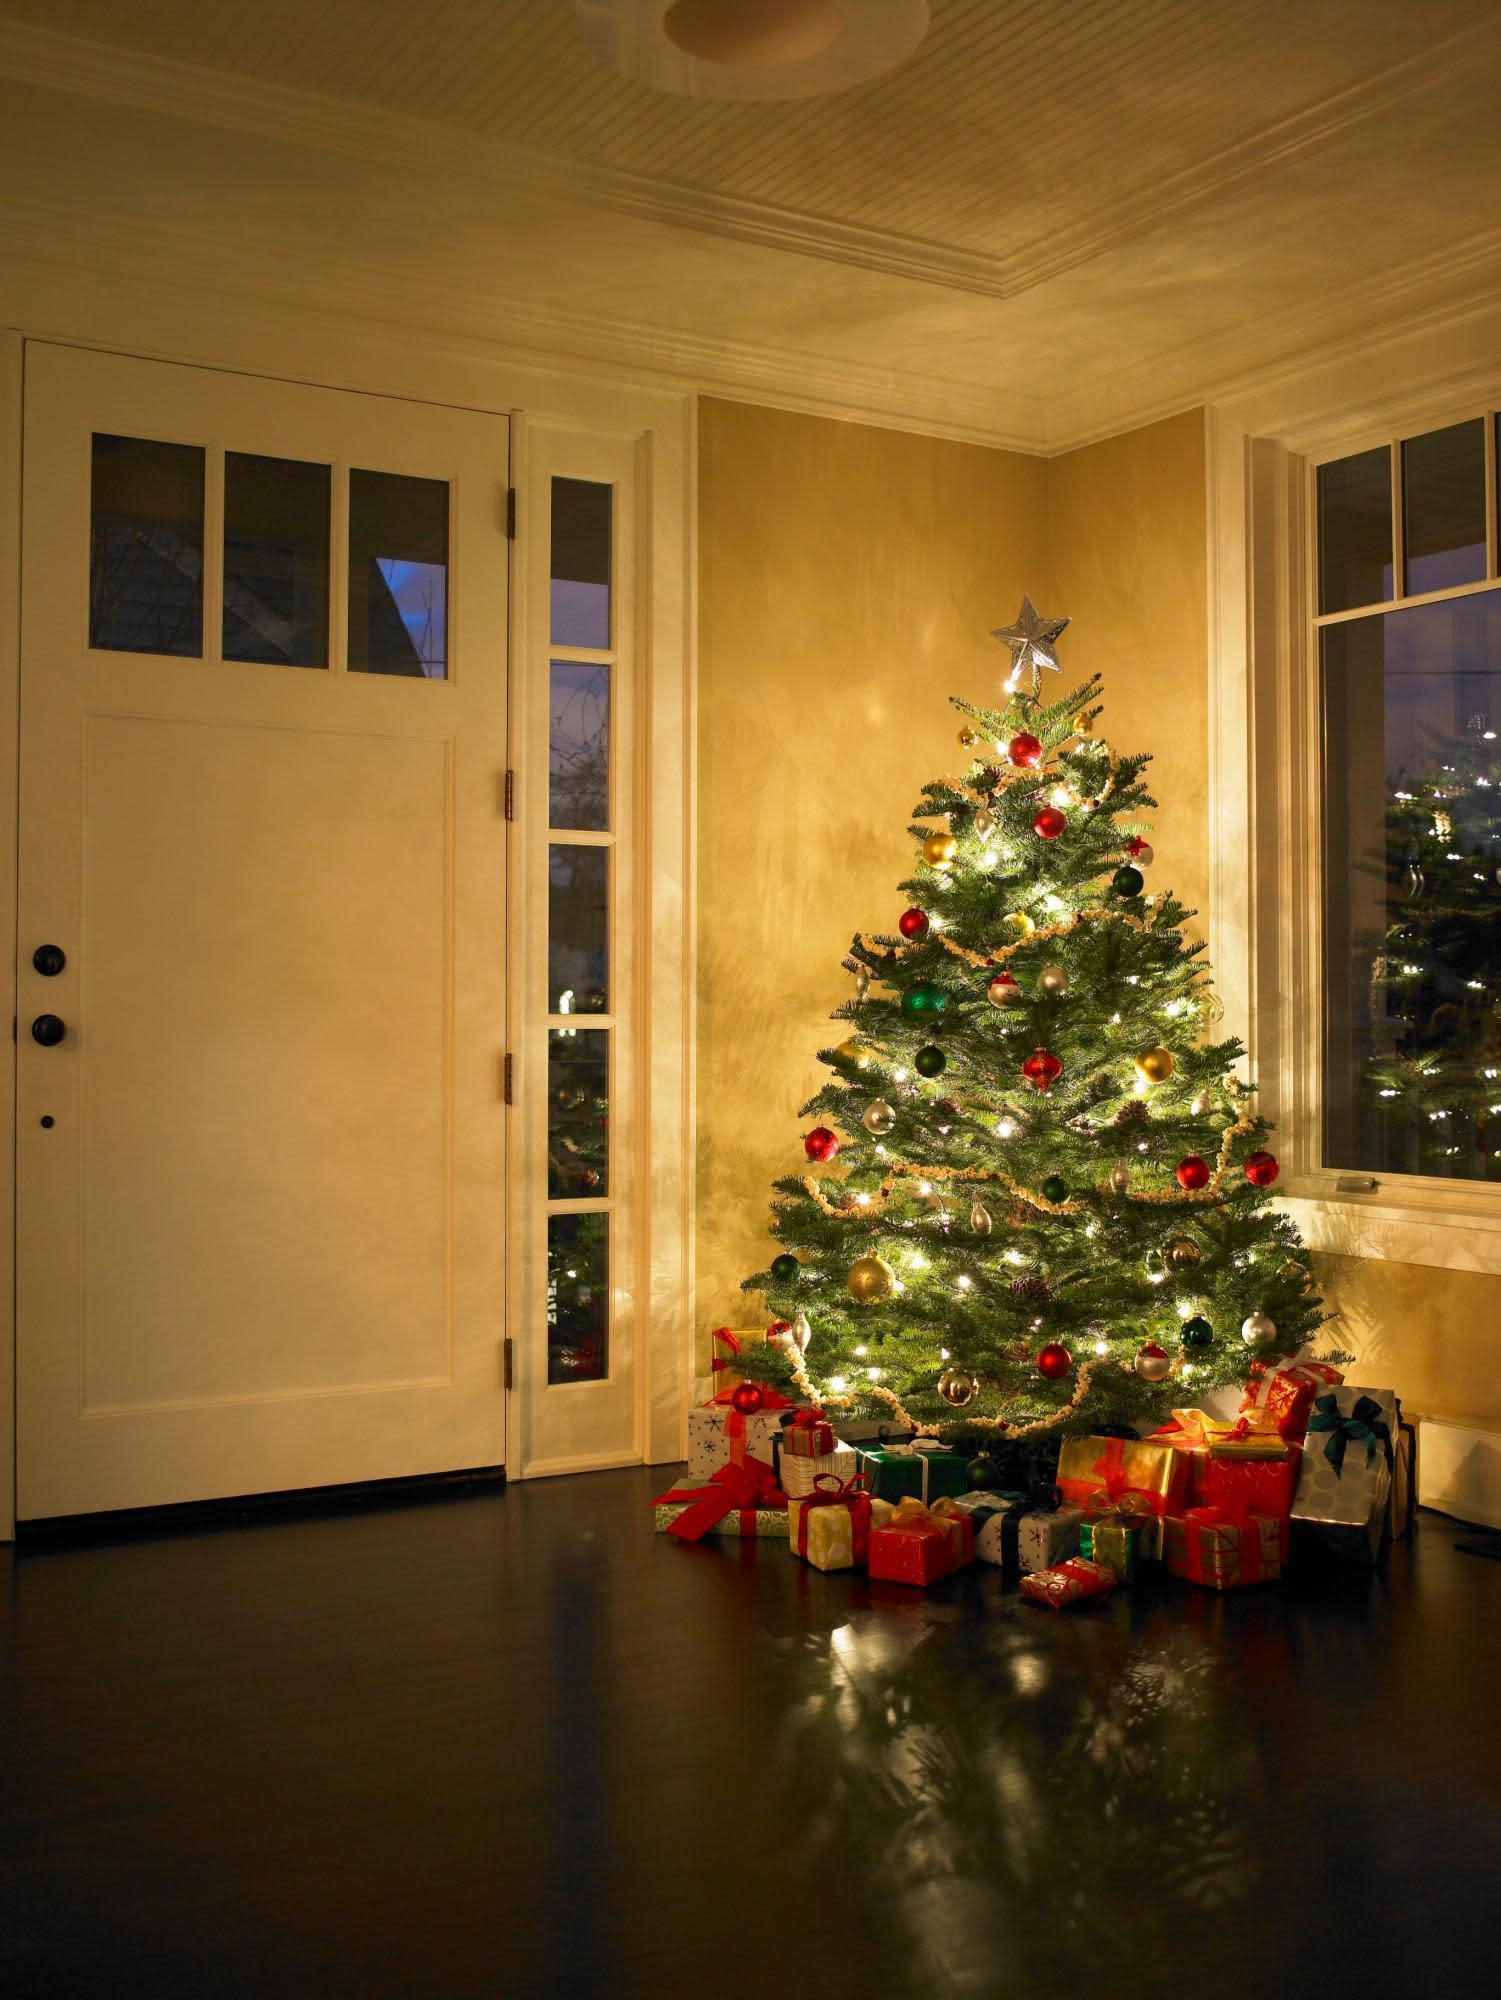 Krinner Christmas Tree Genie - Image Home Garden and Tree Rtecx.Com